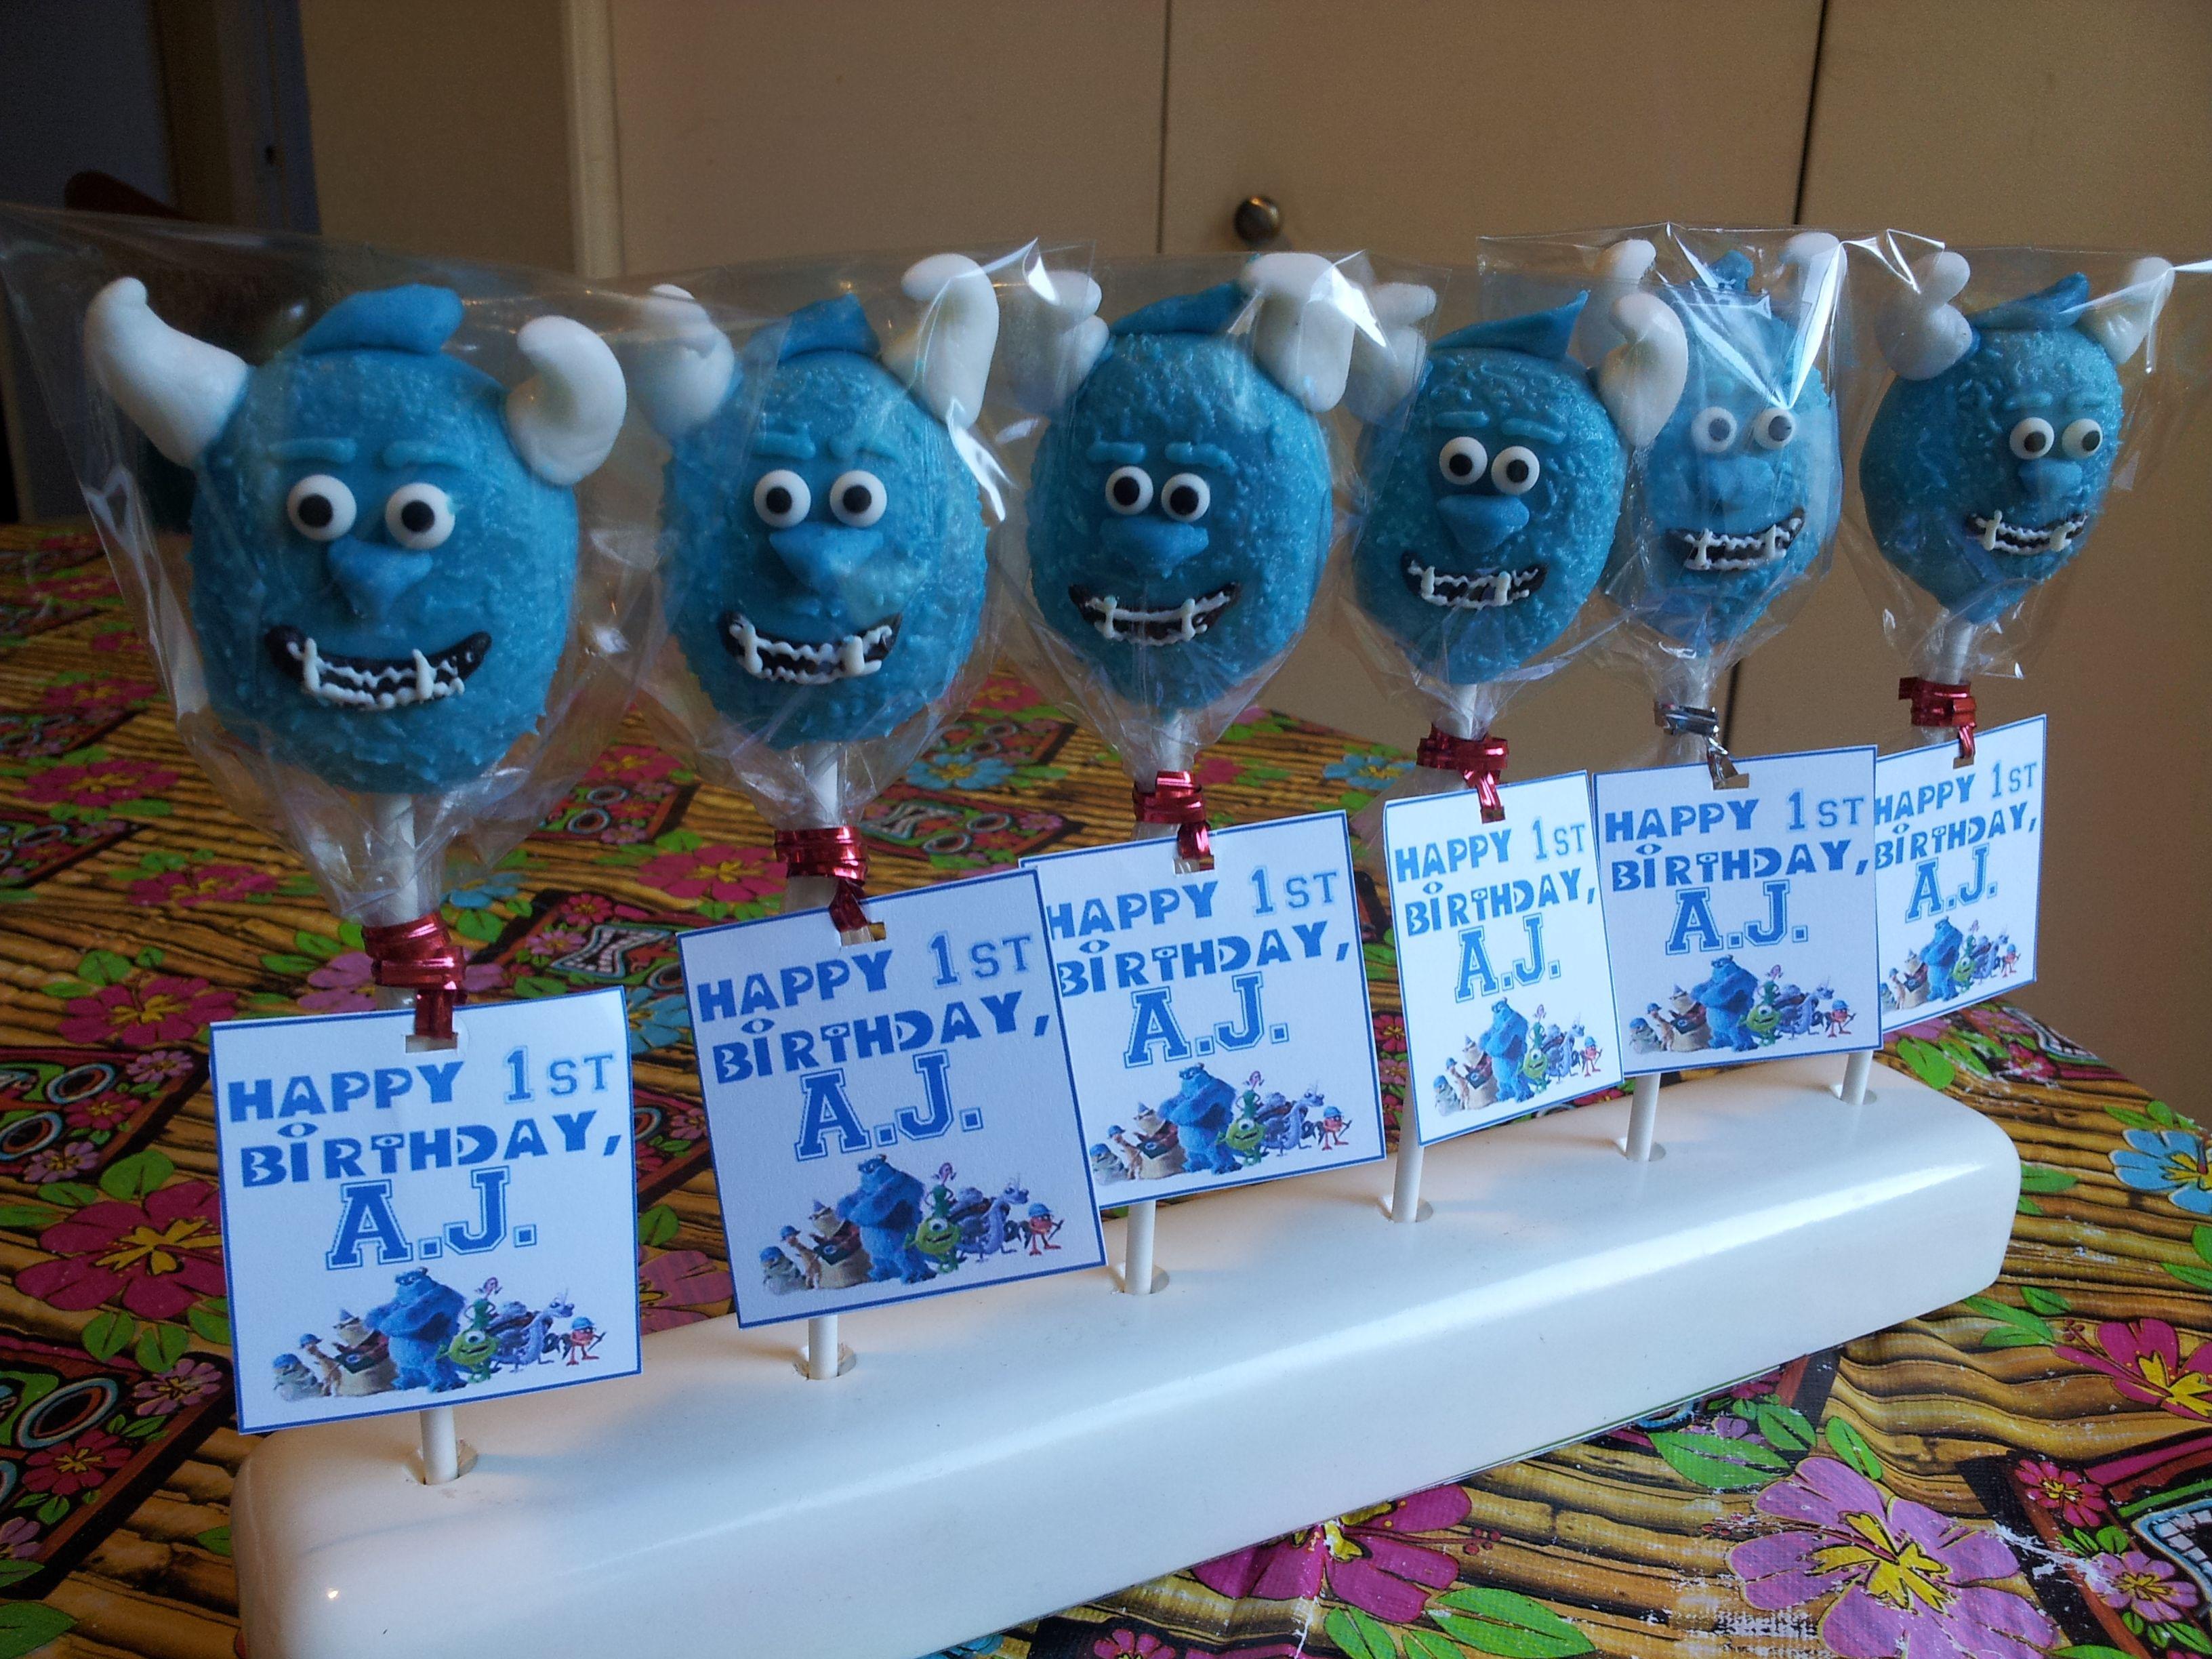 Monsters Inc Cake Pops Mike Waszowski Cake Pops Sulley Cake Pops